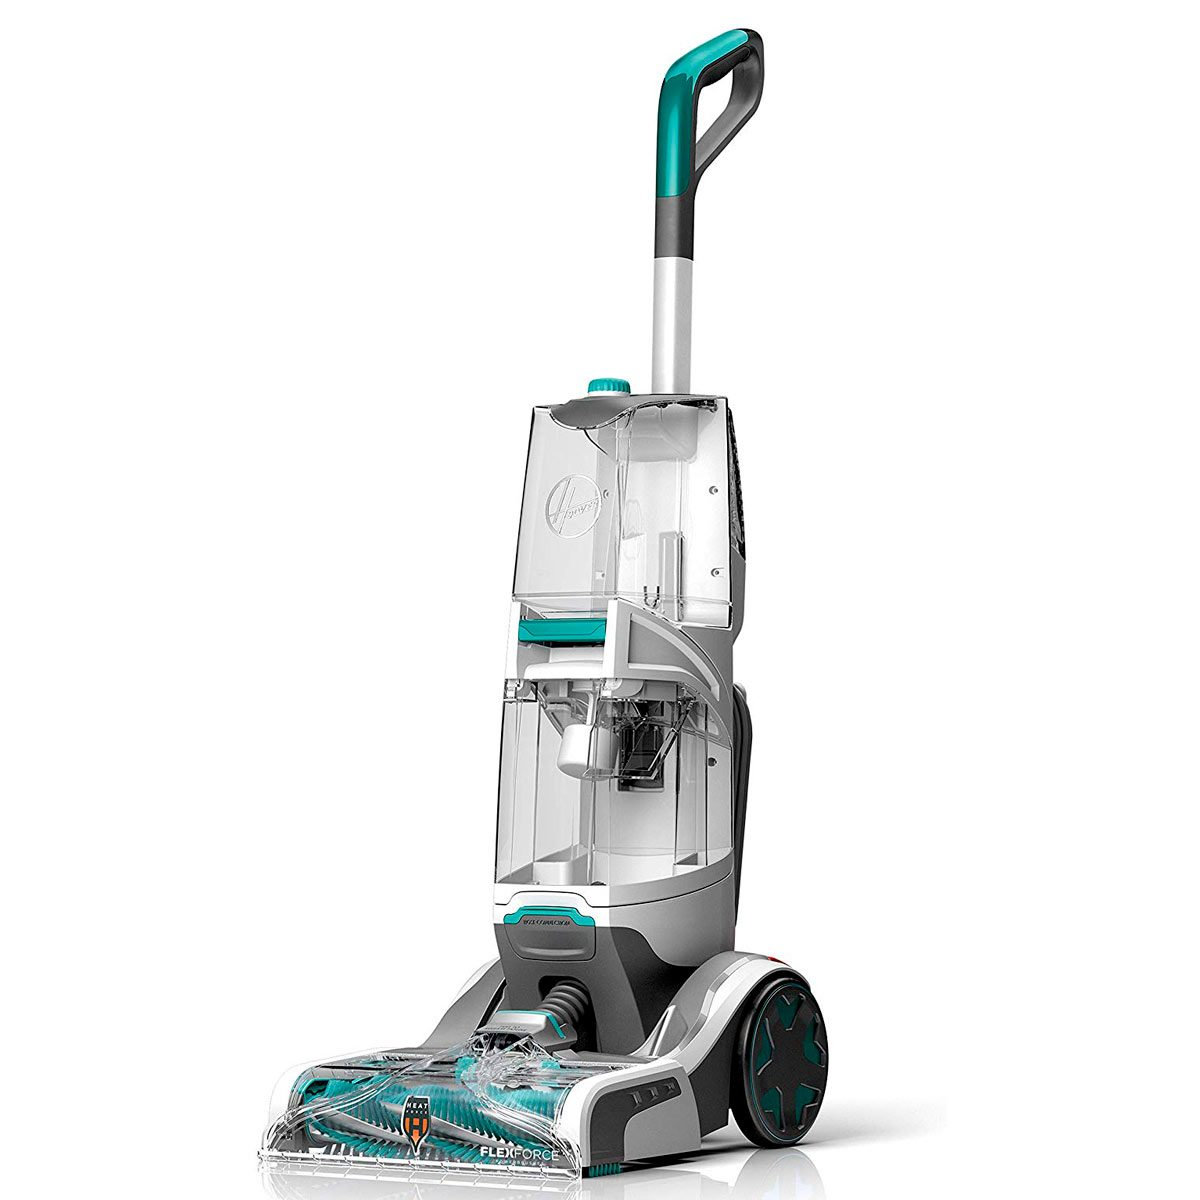 smartwash carpet cleaner